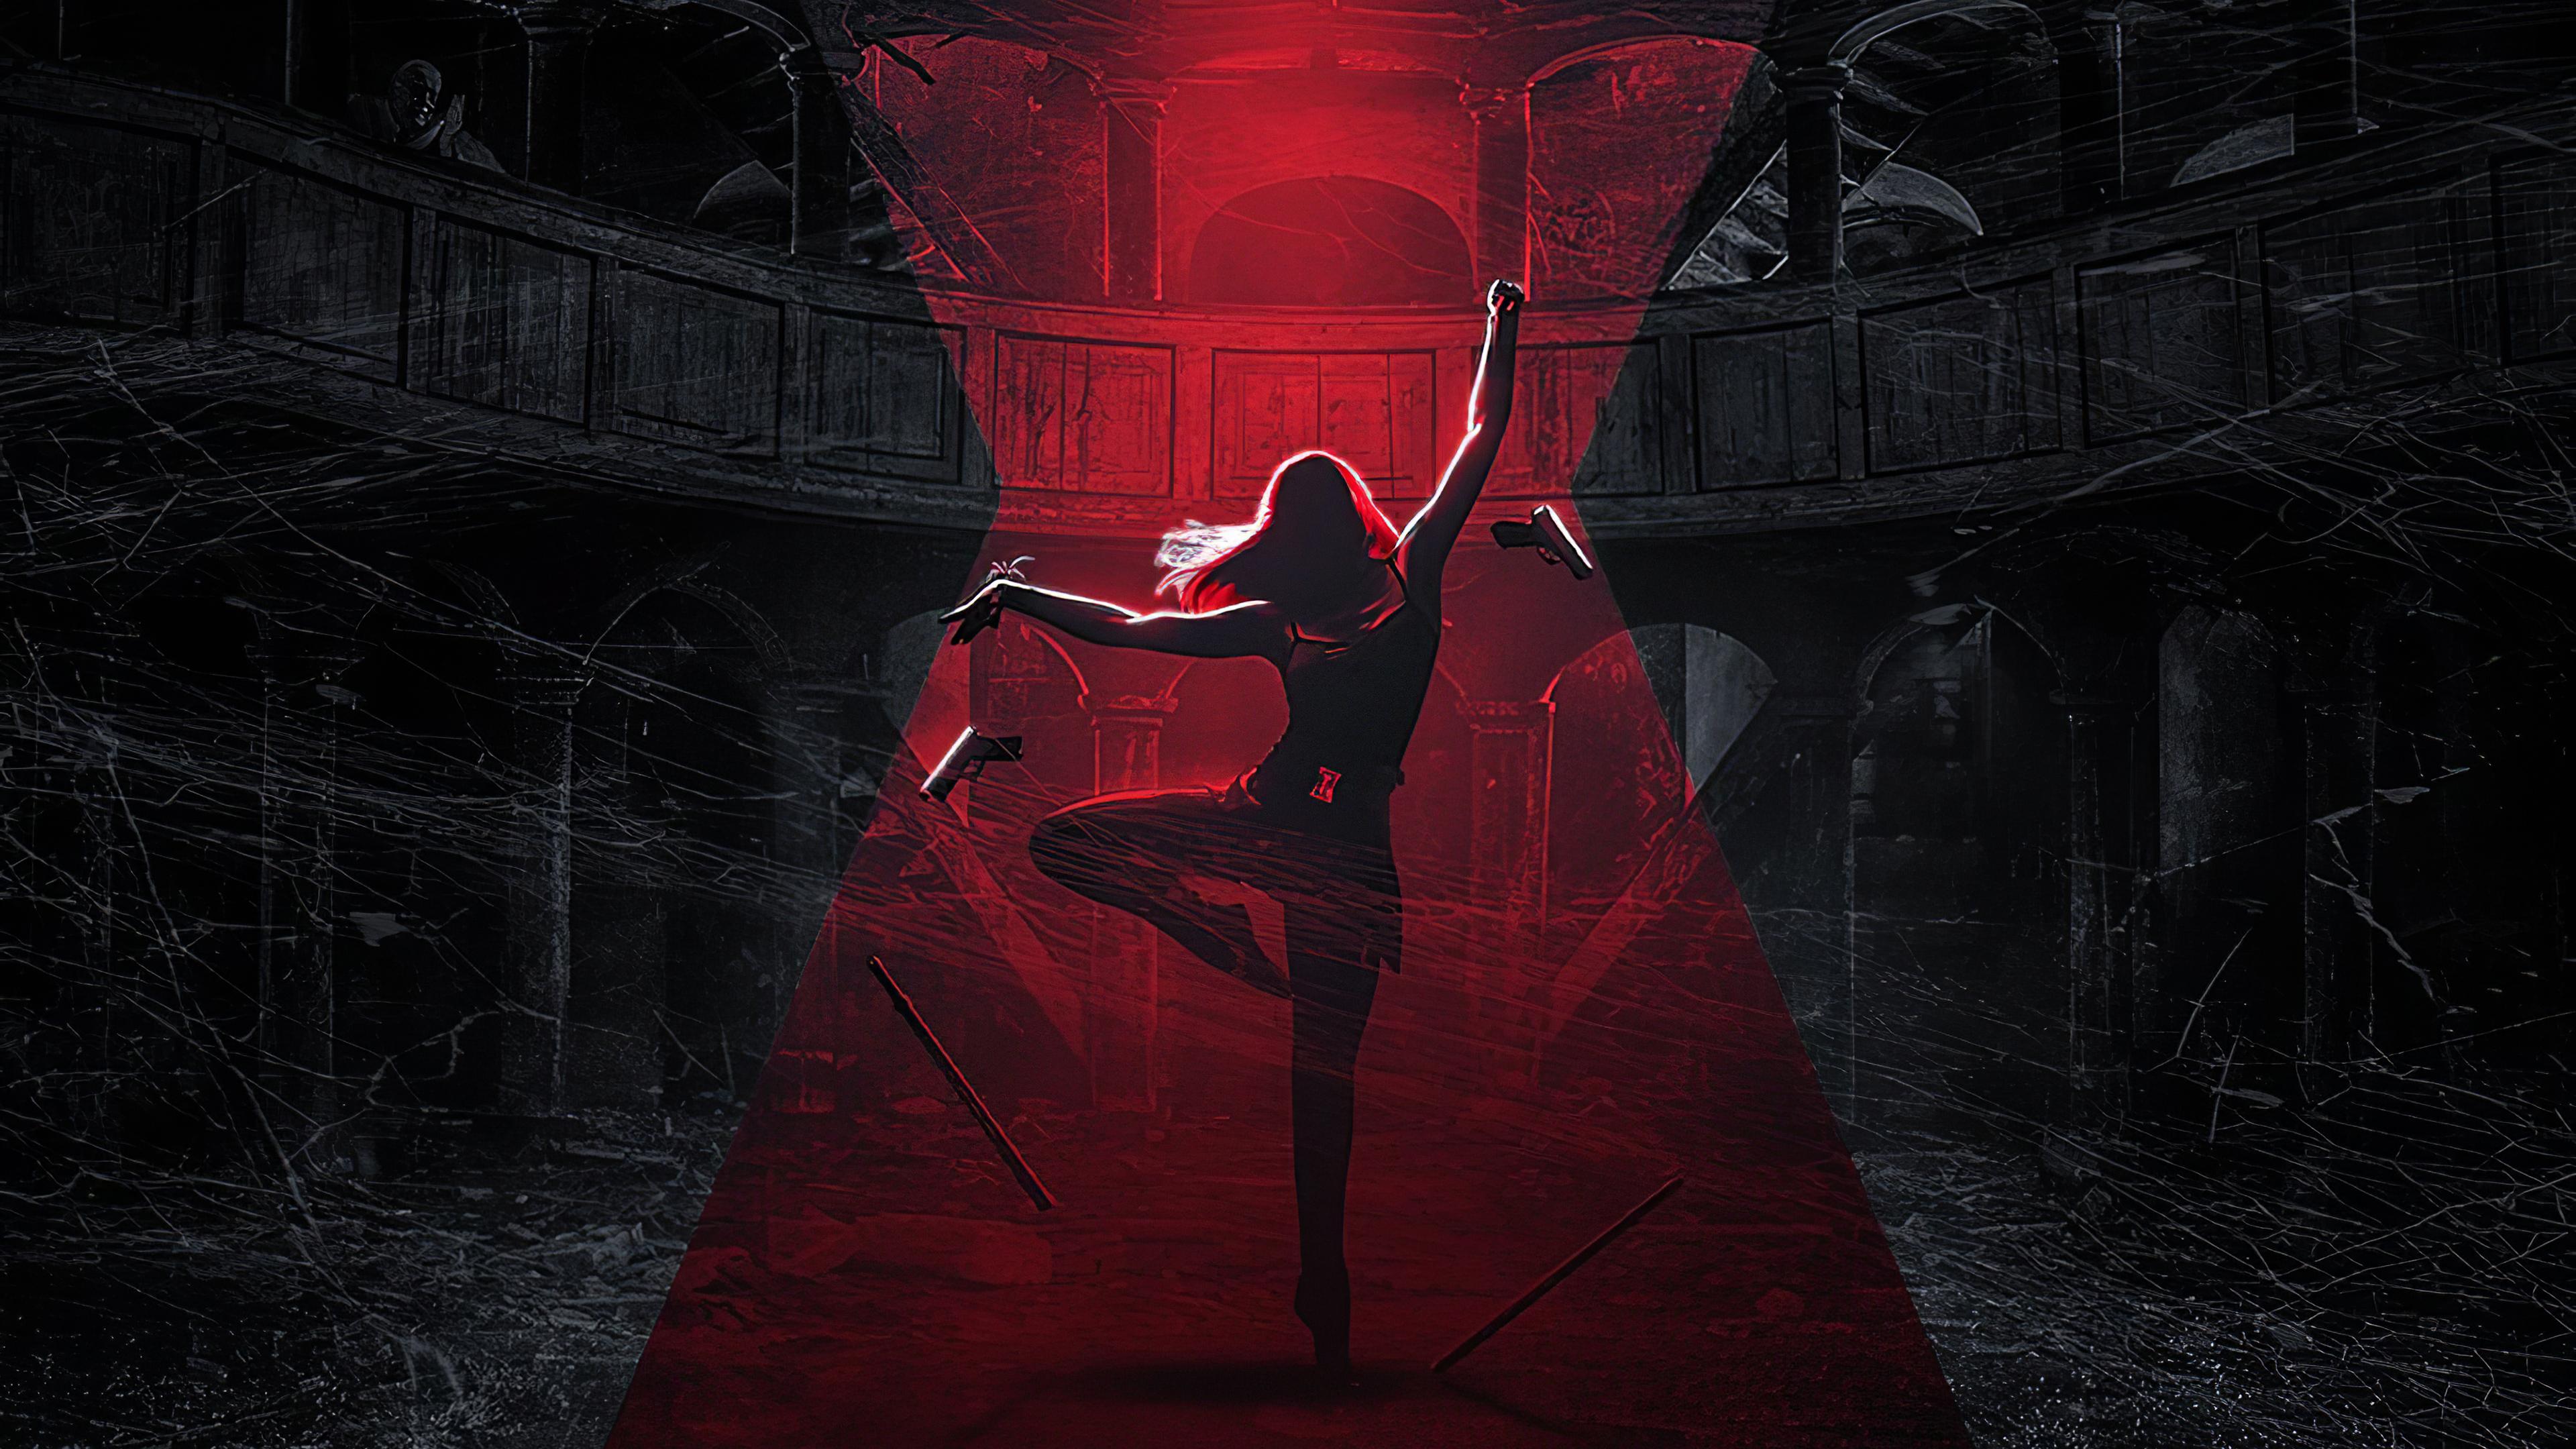 black widow movie fanart 1576584632 - Black Widow Movie FanArt - black widow red wallpaper 4k, Black Widow Movie Red 4k wallpaper, 4k black widows wallpaper